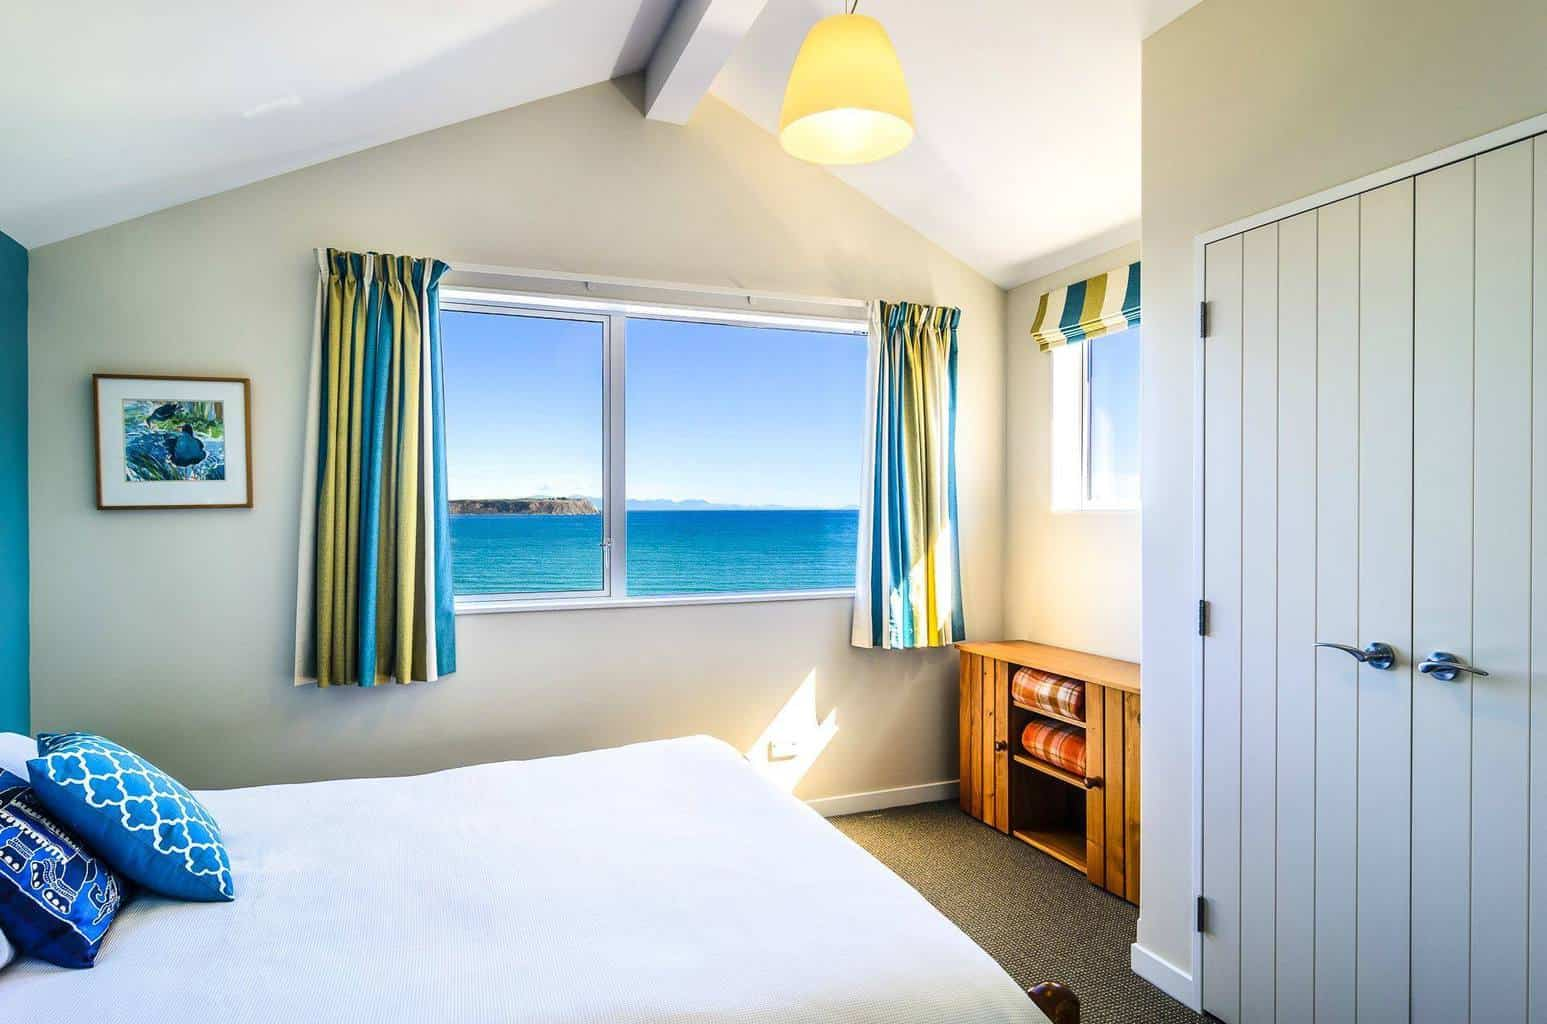 27 amazing bedroom designs you need to see elite rest for Bedroom inspiration reddit